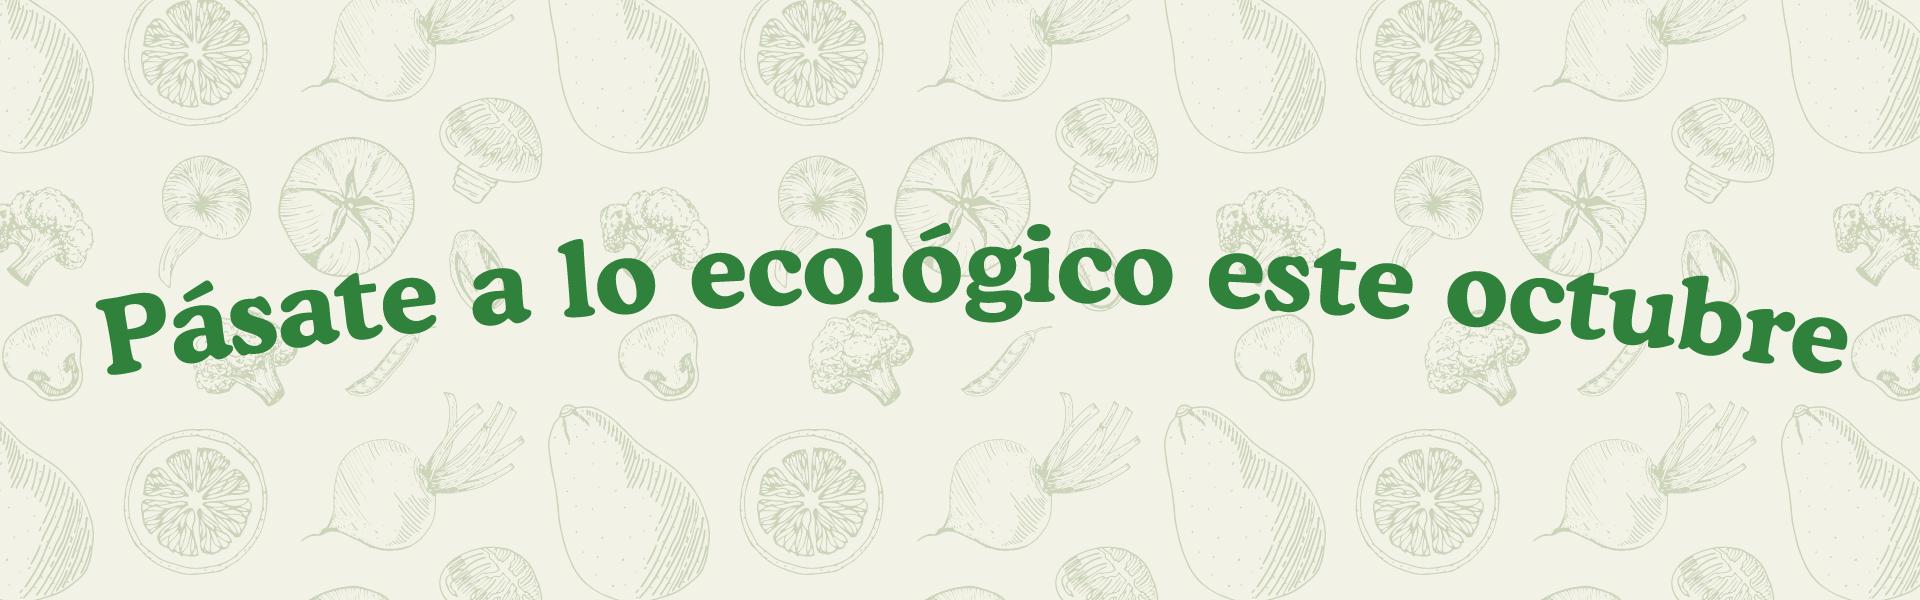 Pasate a lo ecologico este octubre